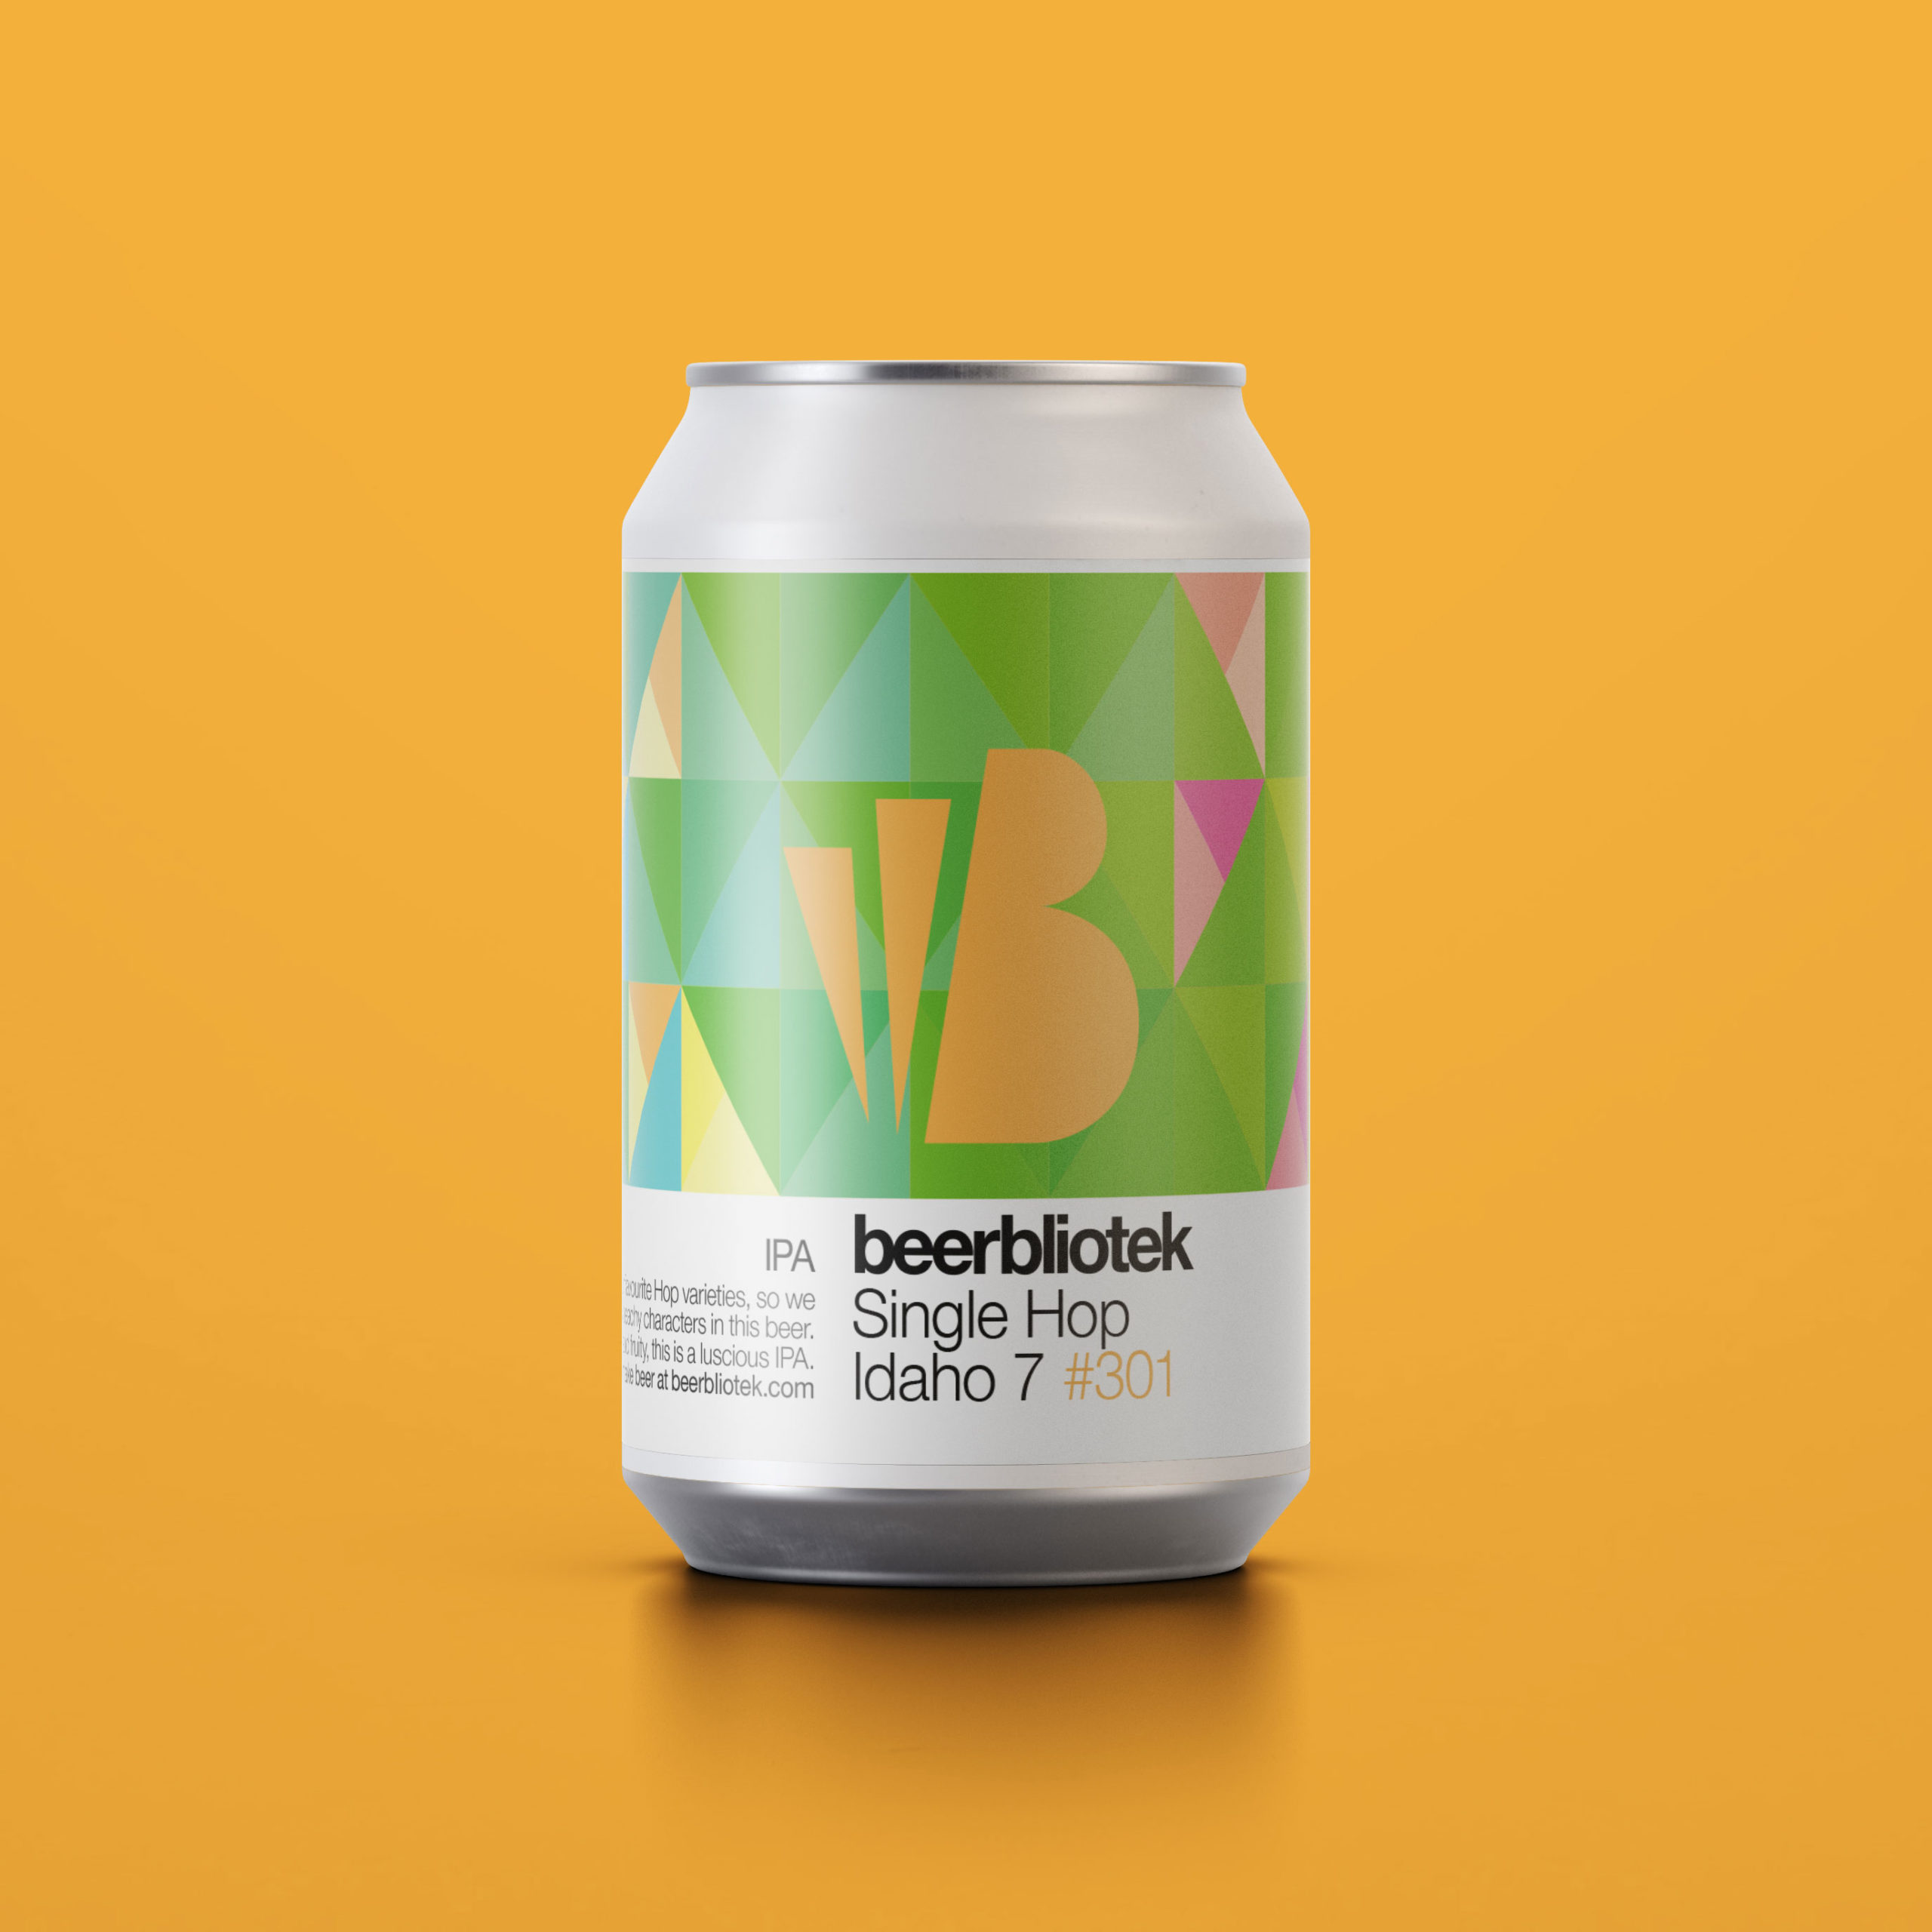 A marketing can packshot of Single Hop idaho 7, an IPA, brewed in Gothenburg, by Swedish Craft Brewery Beerbliotek.